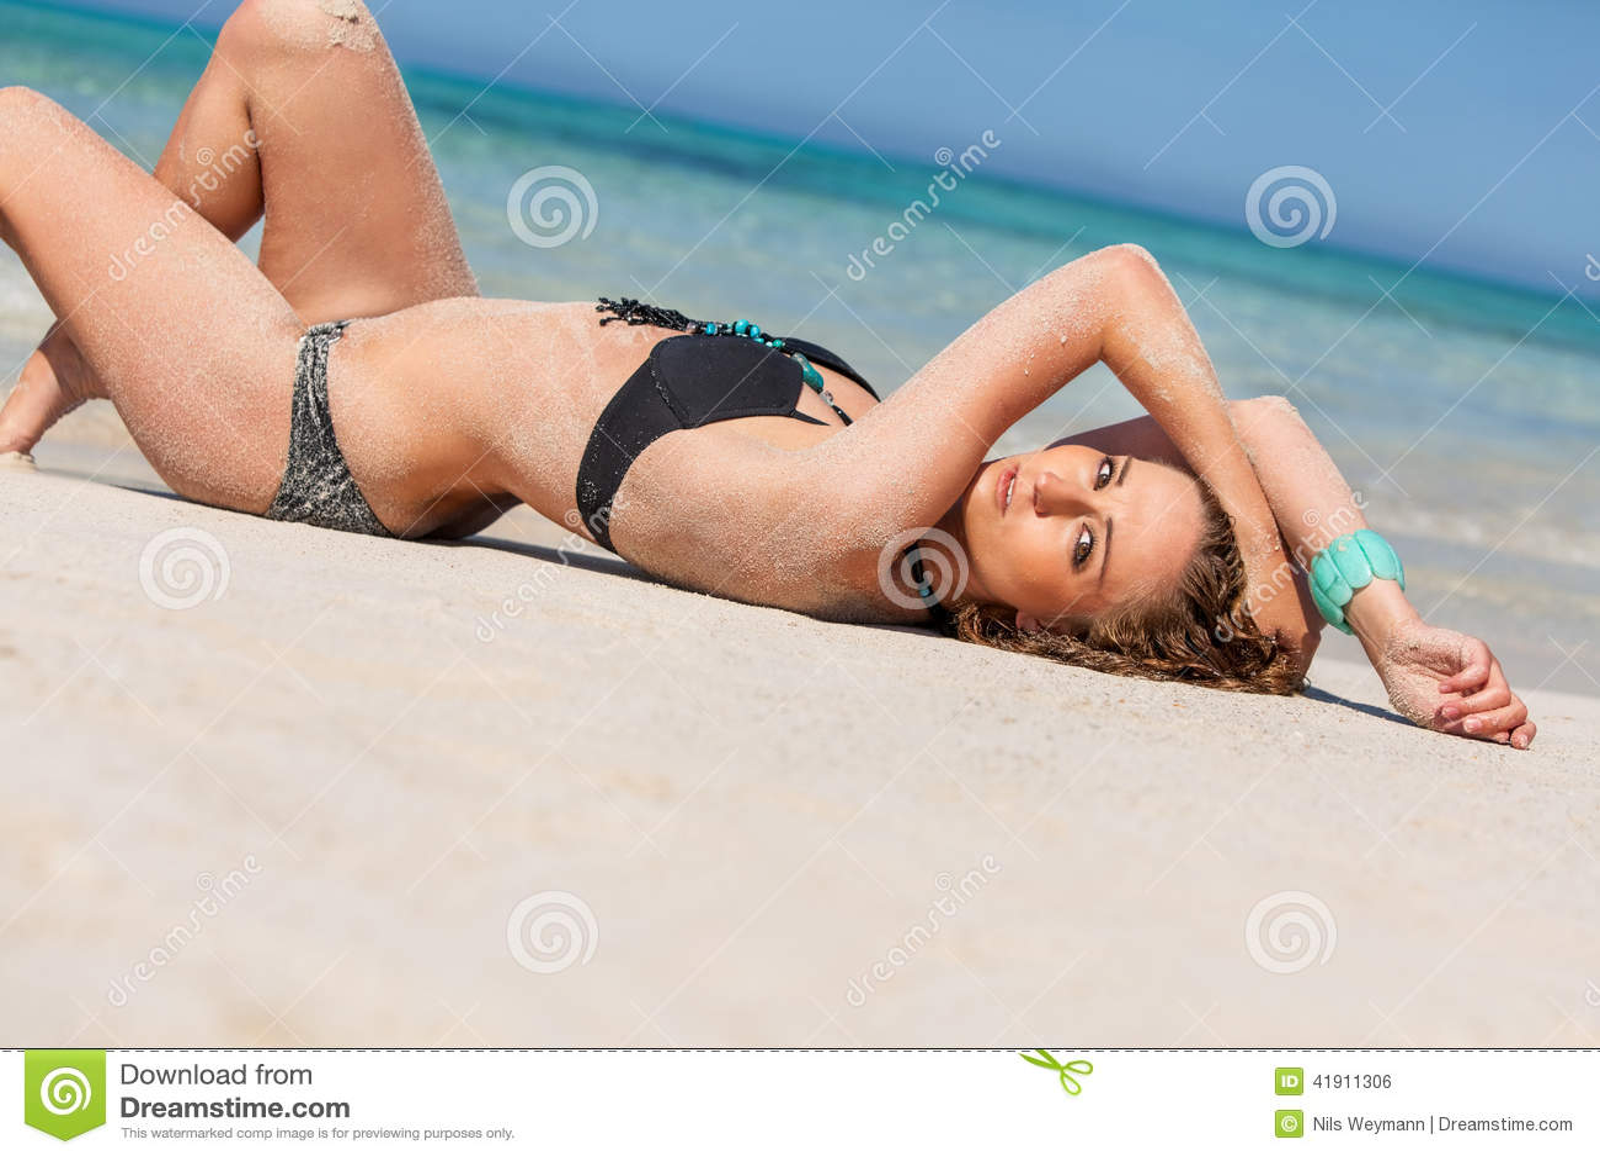 Female model wearing black bikini in the water